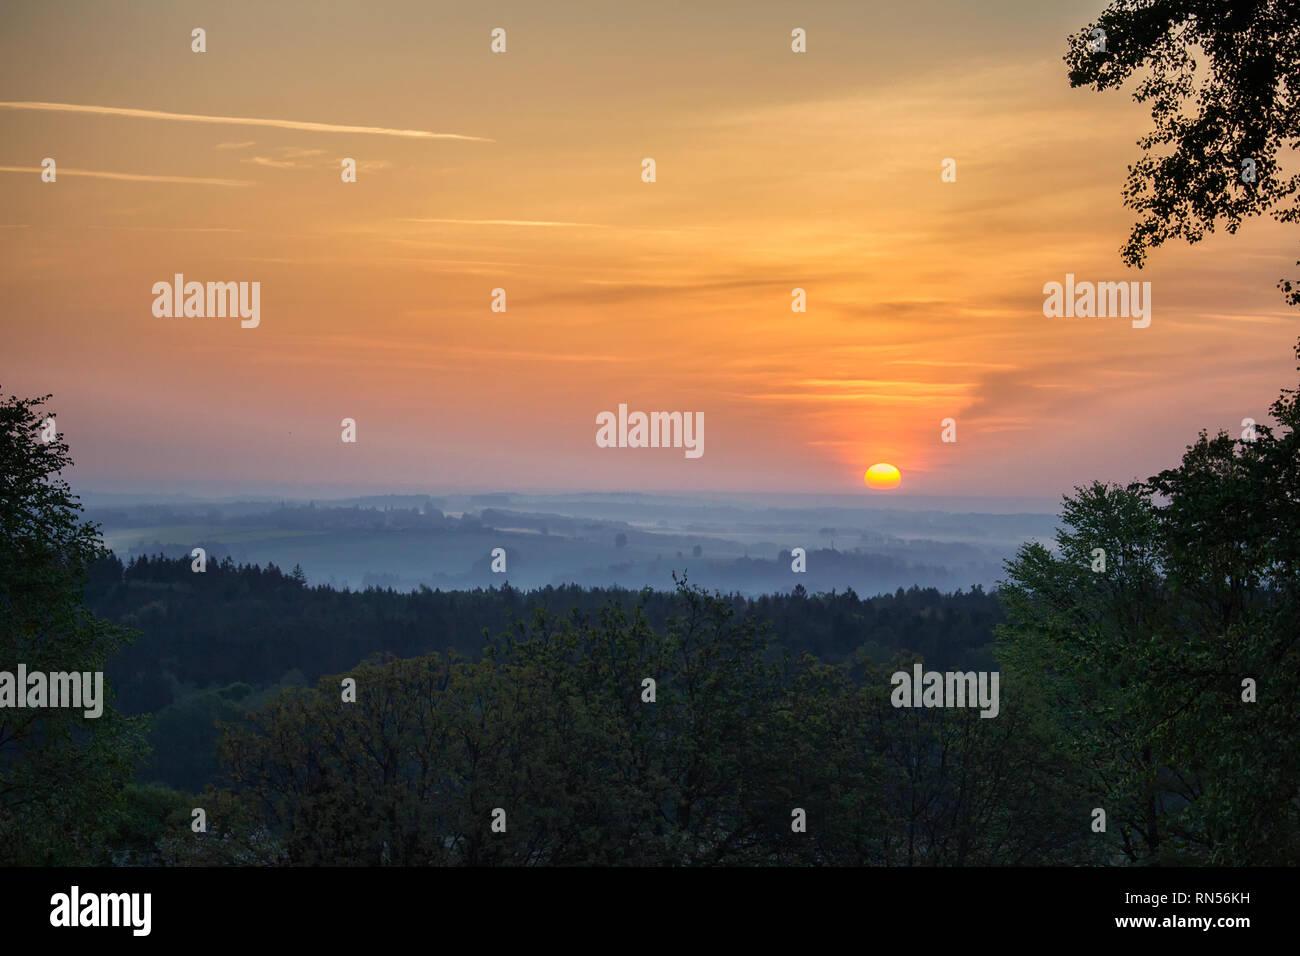 Sunrise over tree and mysty fog. Czech landscape - Stock Image